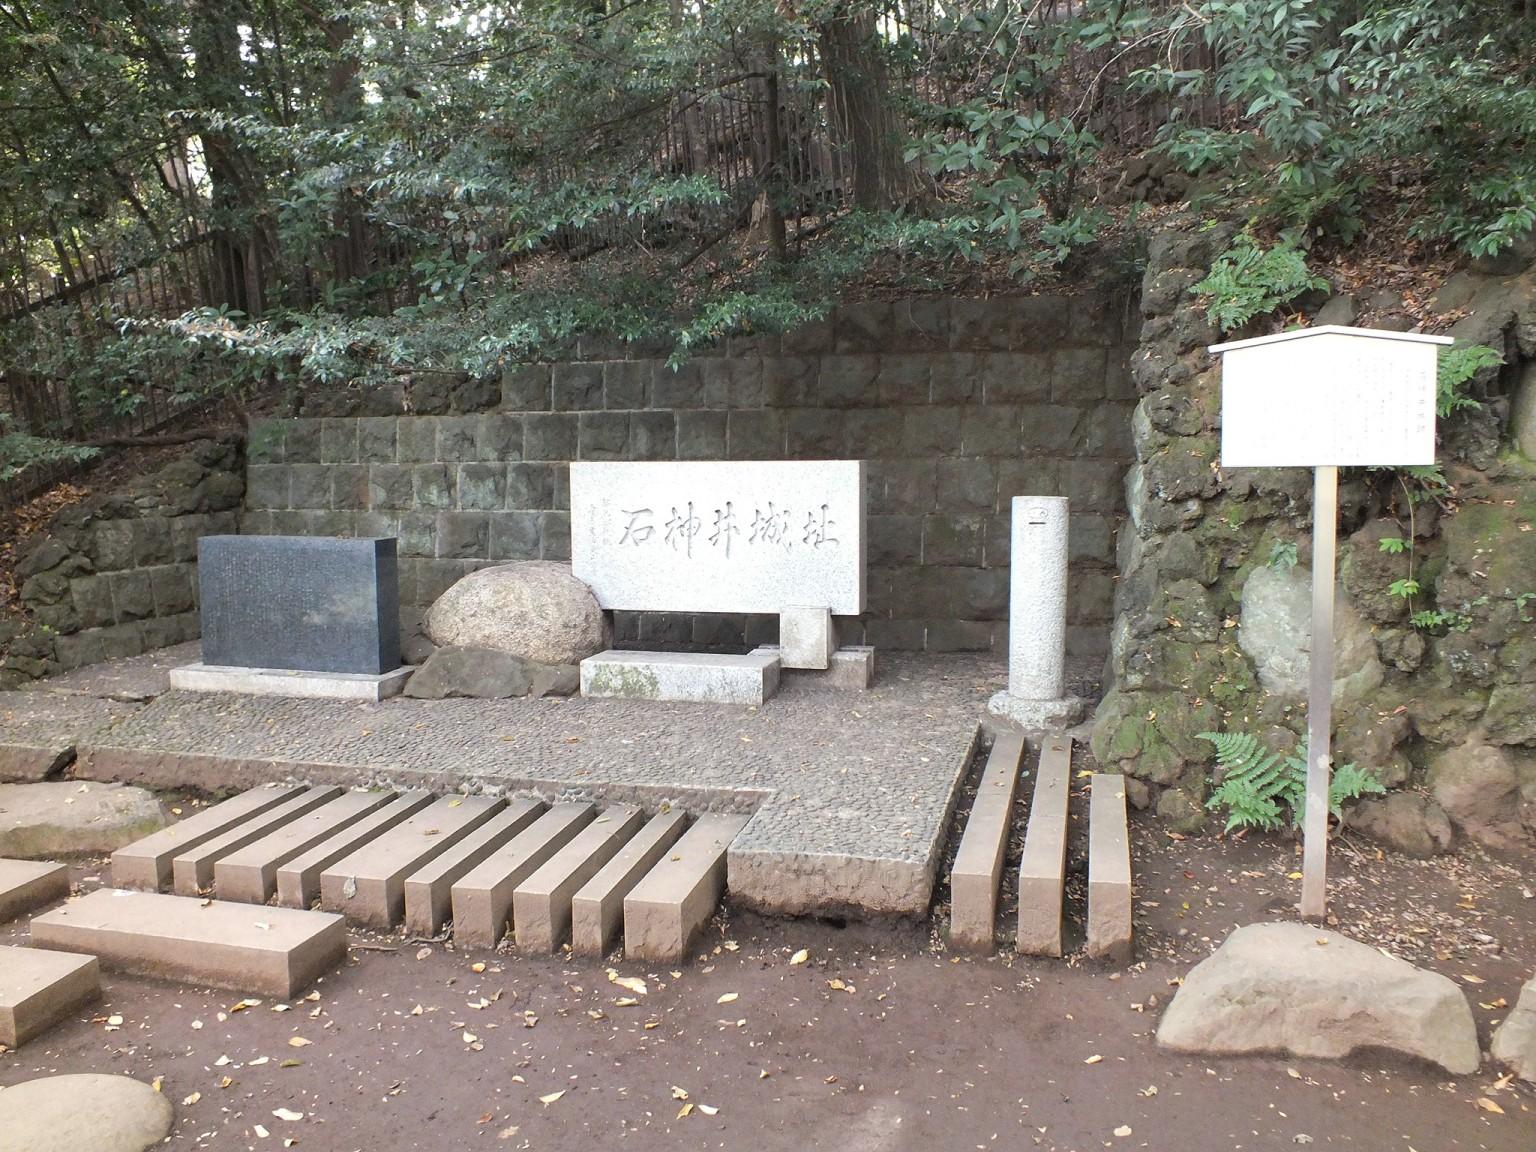 w300h3009I7LUAEC石神井城